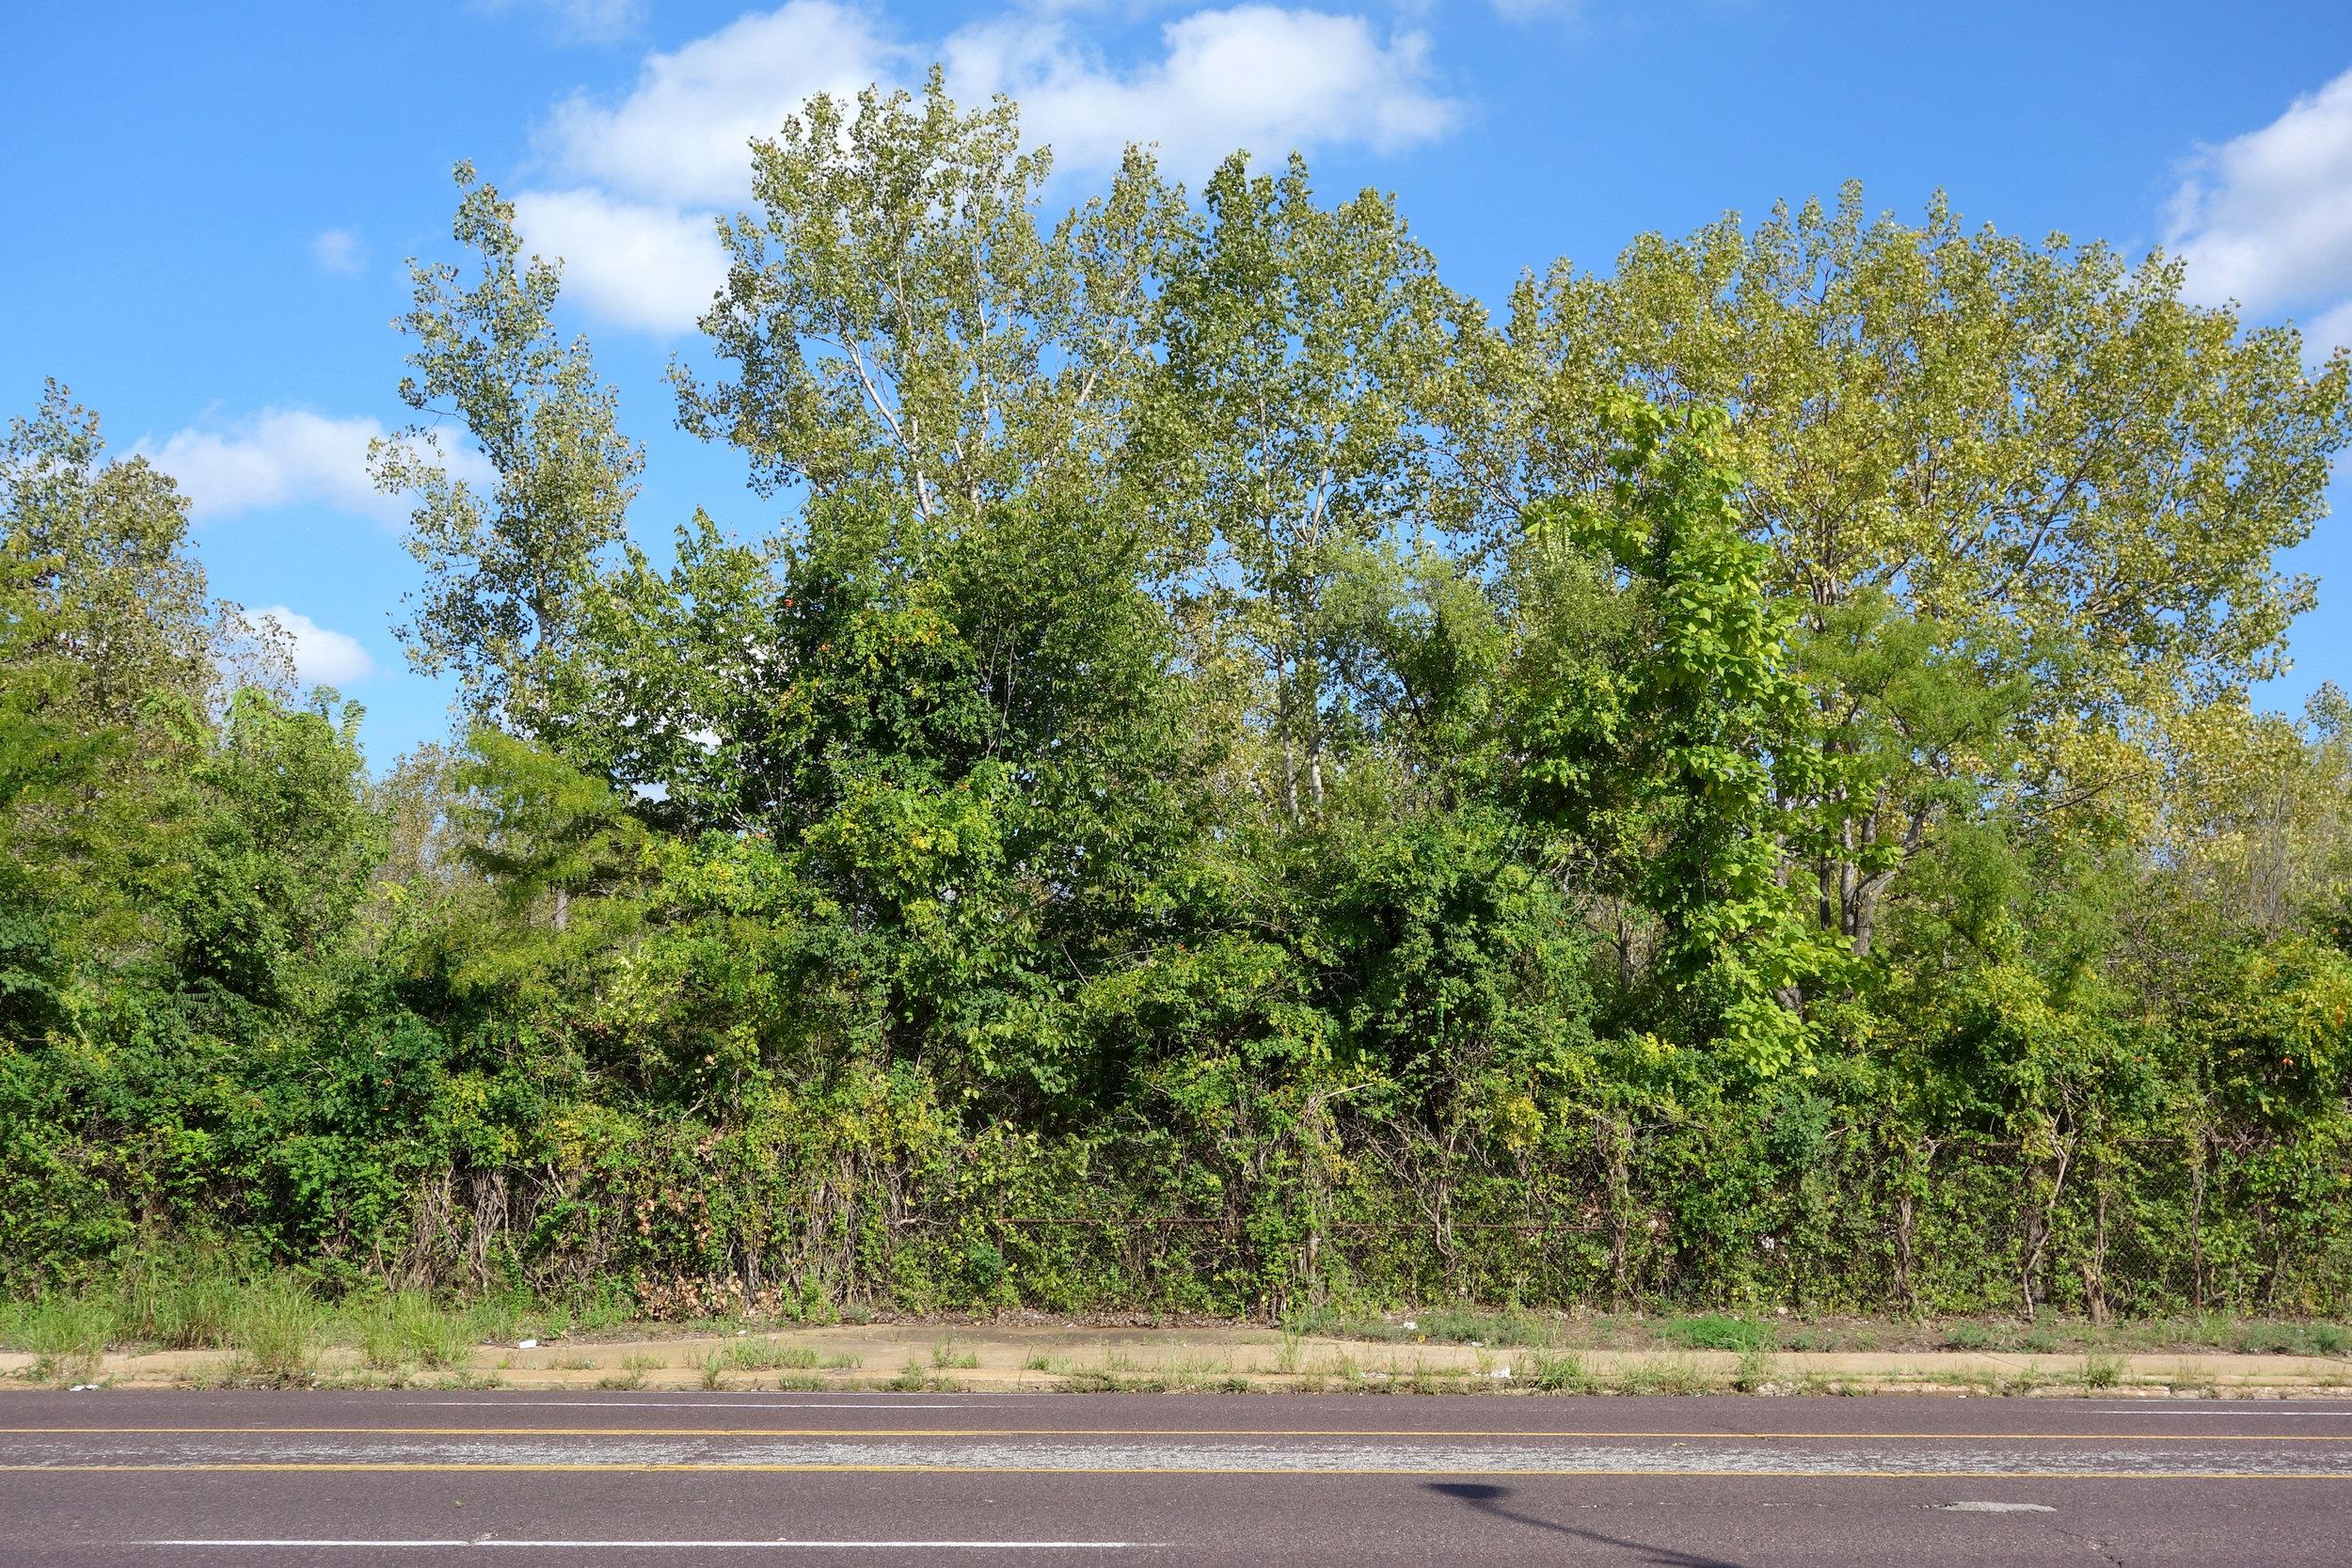 Figure 9. Looking east across Jefferson Avenue to the former Pruitt-Igoe site, St. Louis, 2016. Photograph by Joseph Heathcott.